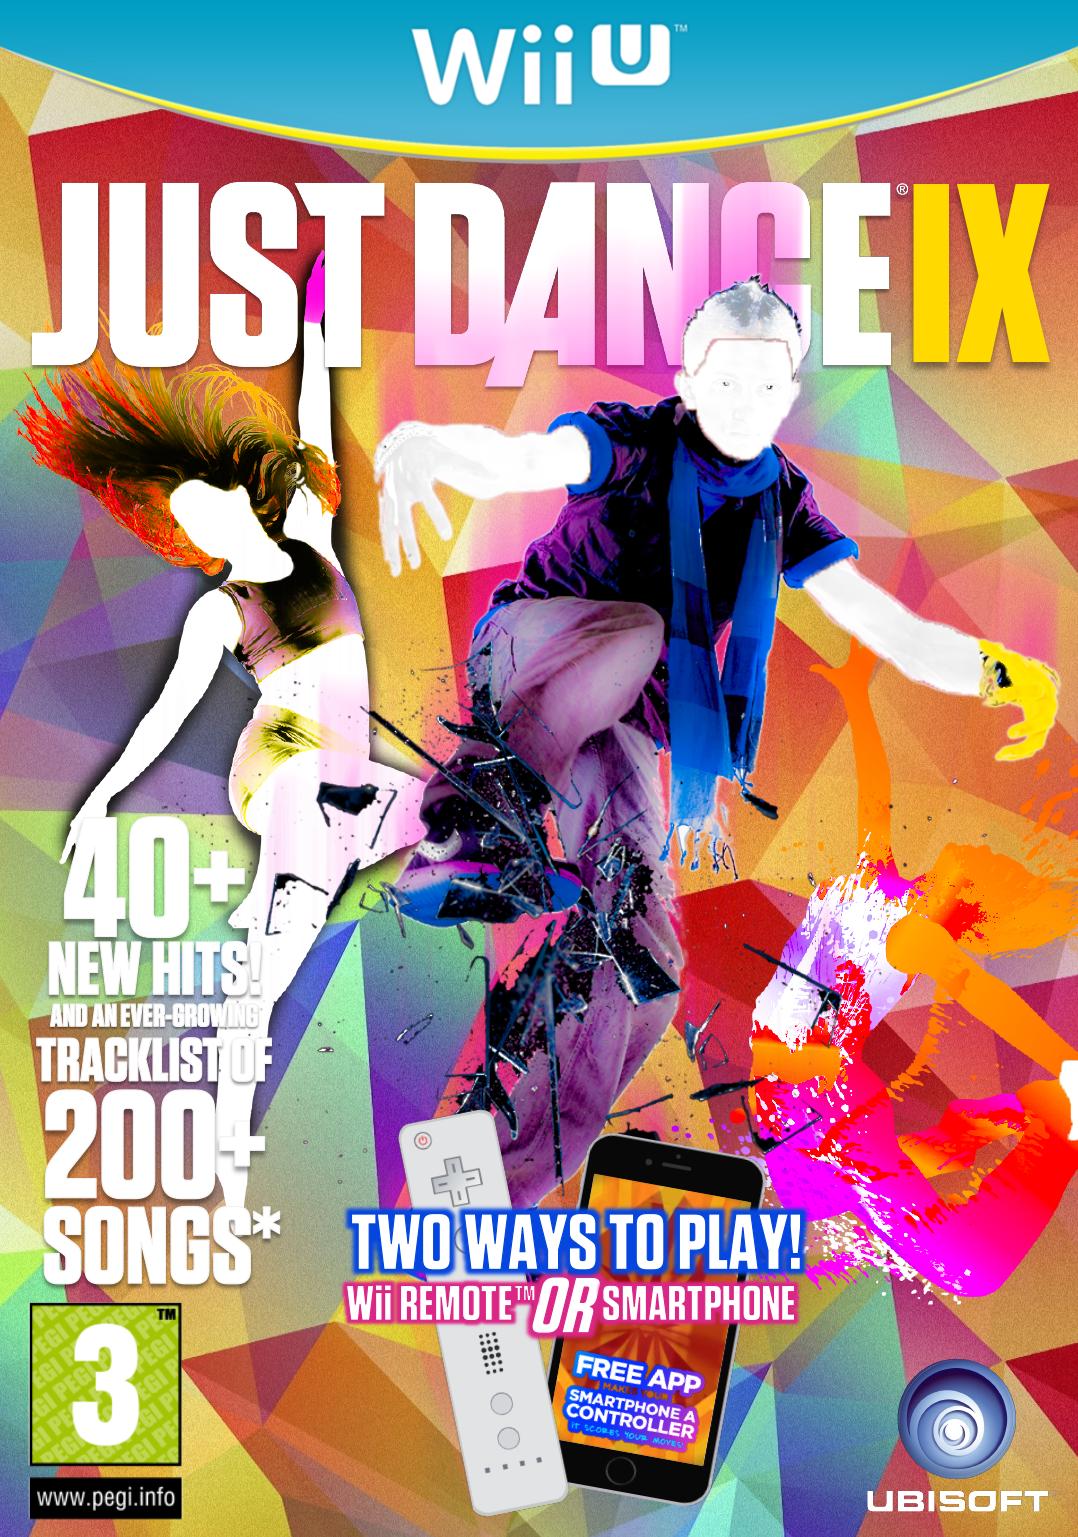 Just Dance IX | Just Dance Fanon Wiki | FANDOM powered by Wikia